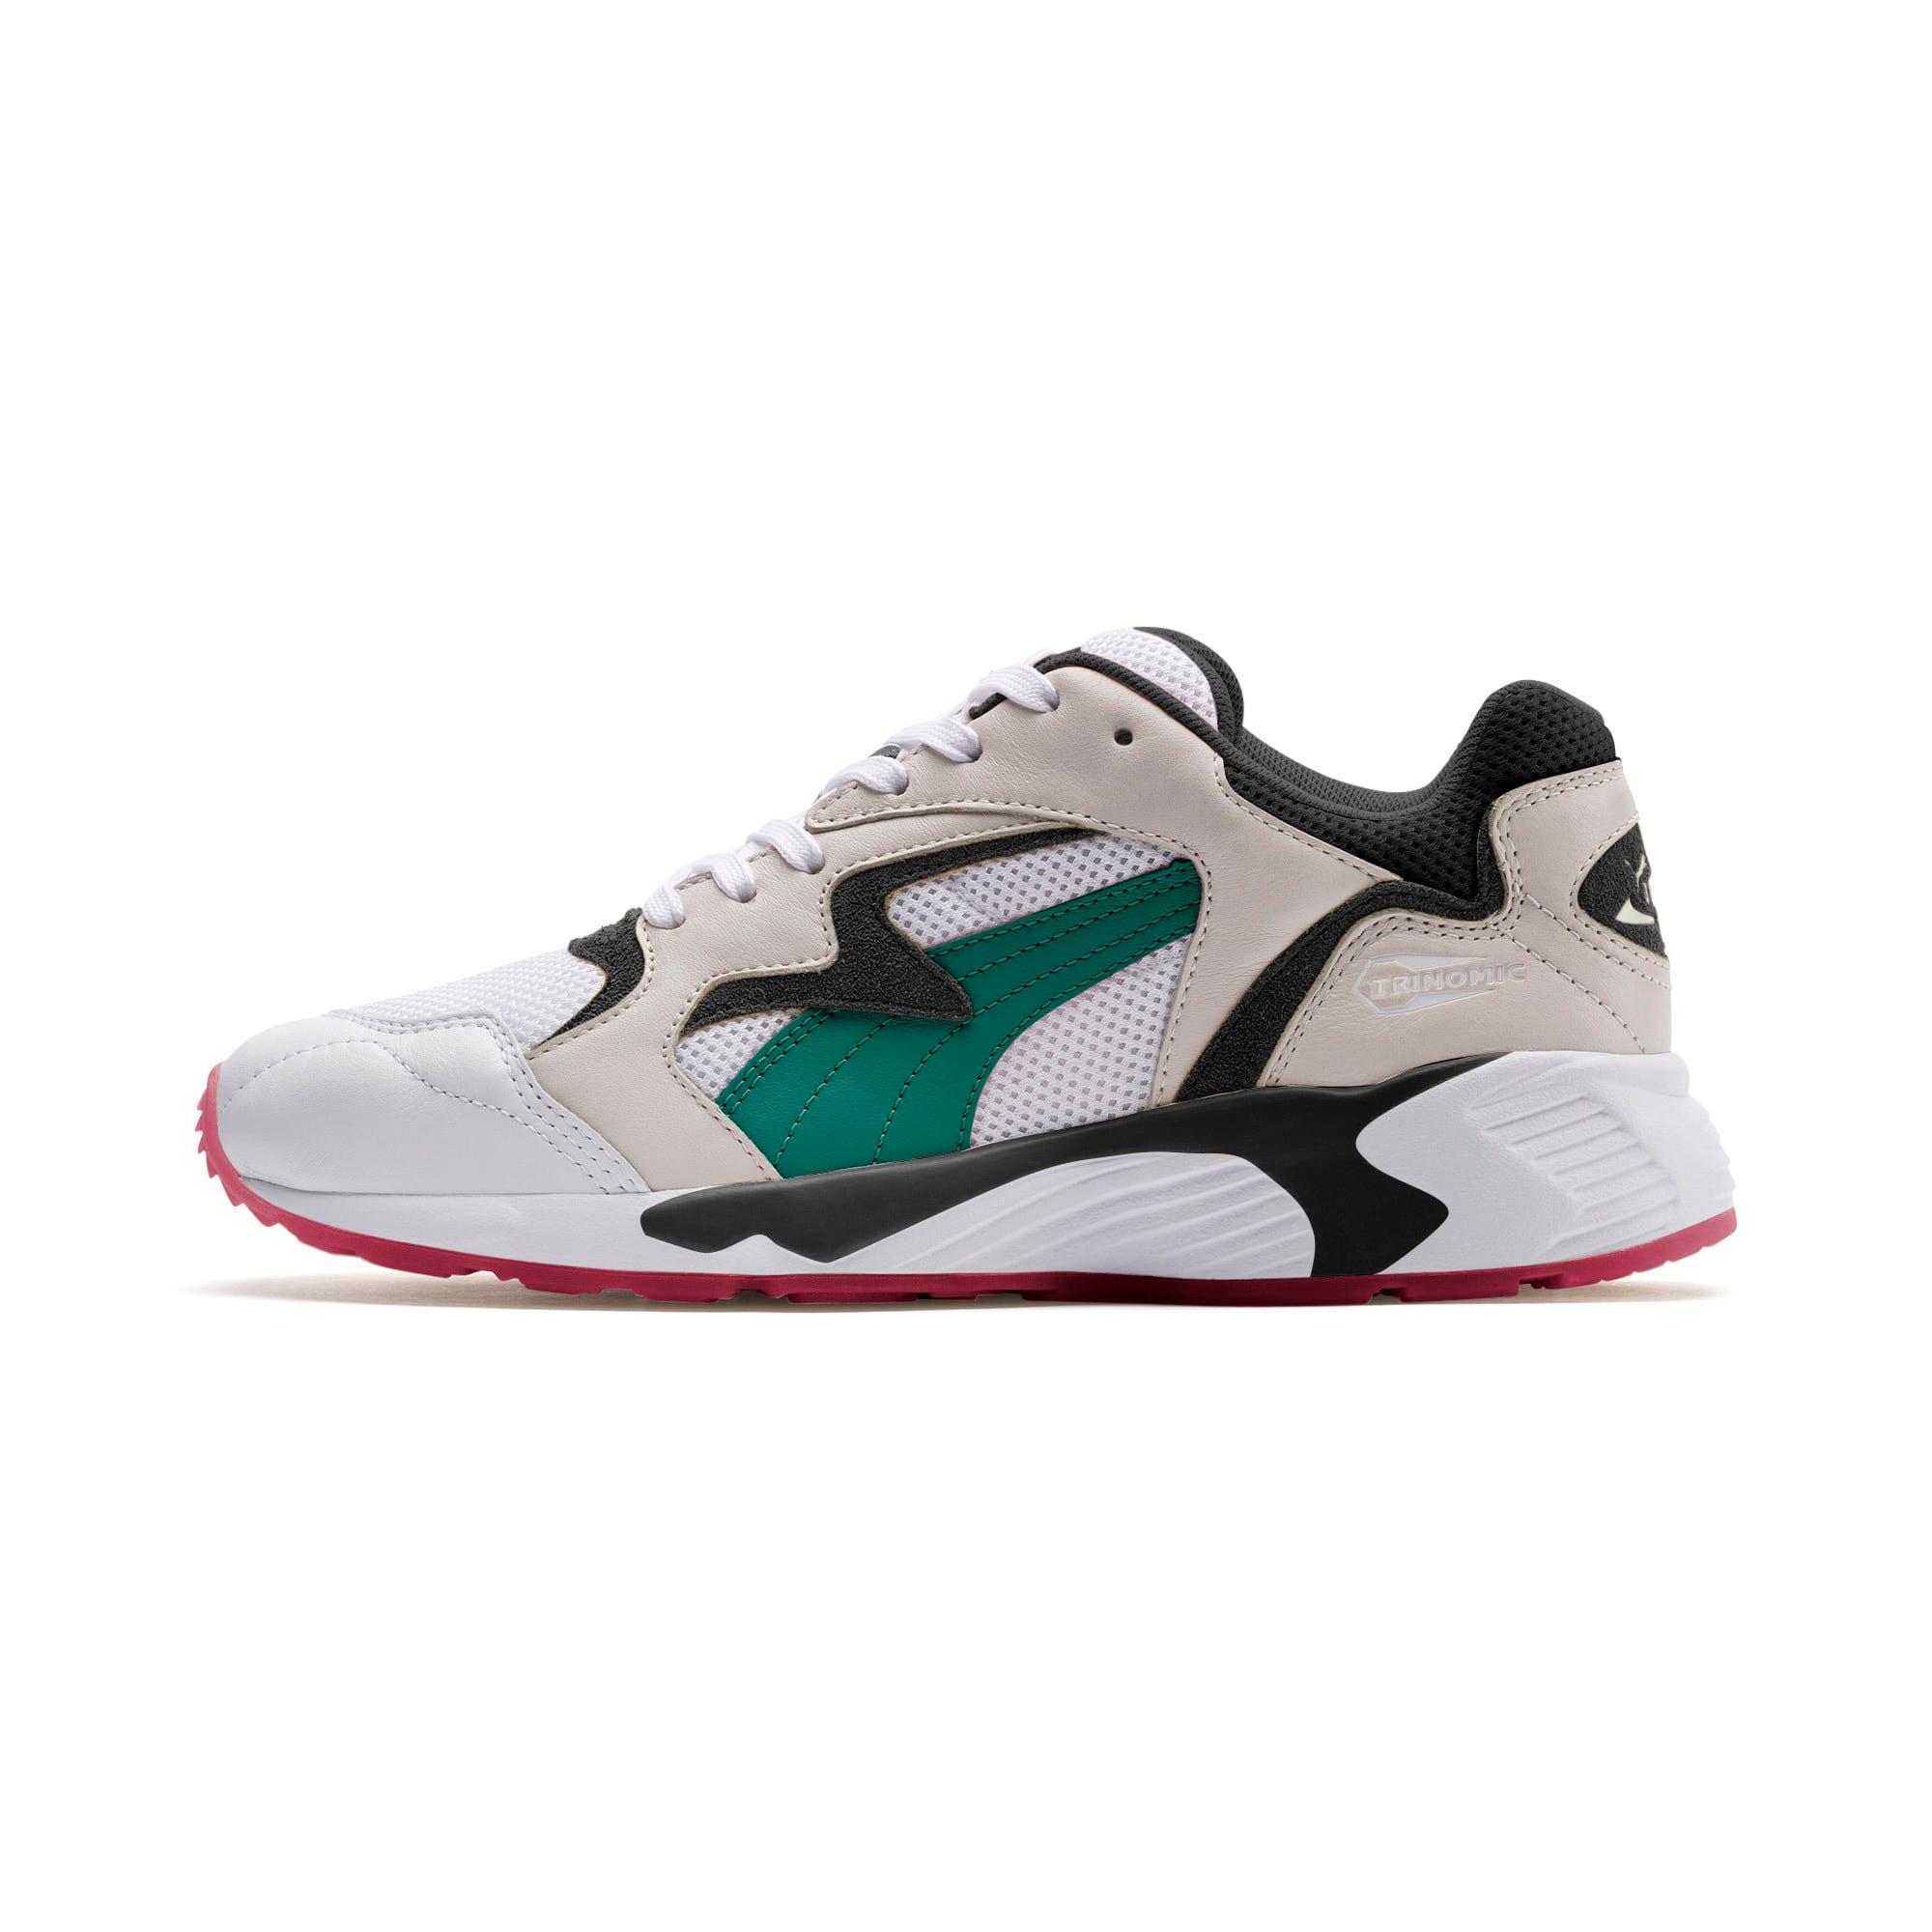 Thumbnail 1 of Prevail Classic Sneakers, Puma White-Teal Green, medium